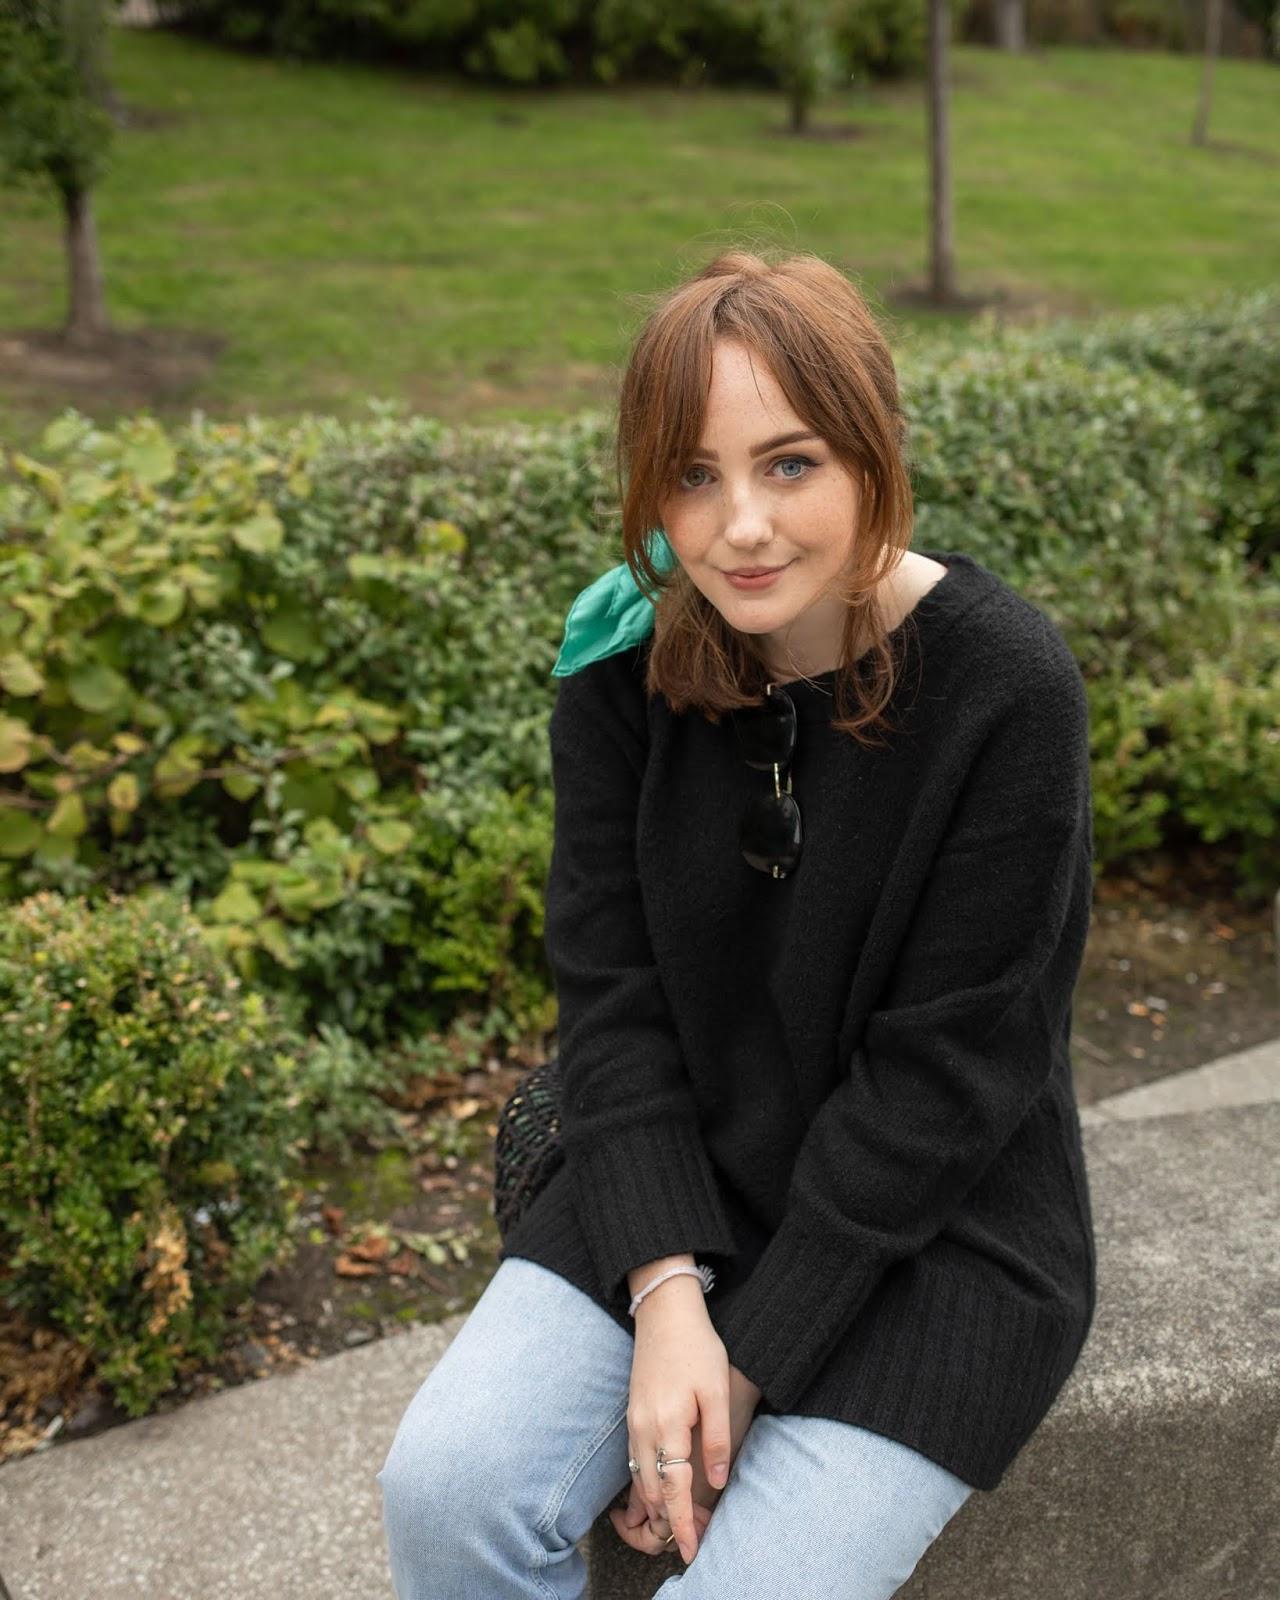 blogger styling oversized jumper autumn 2018